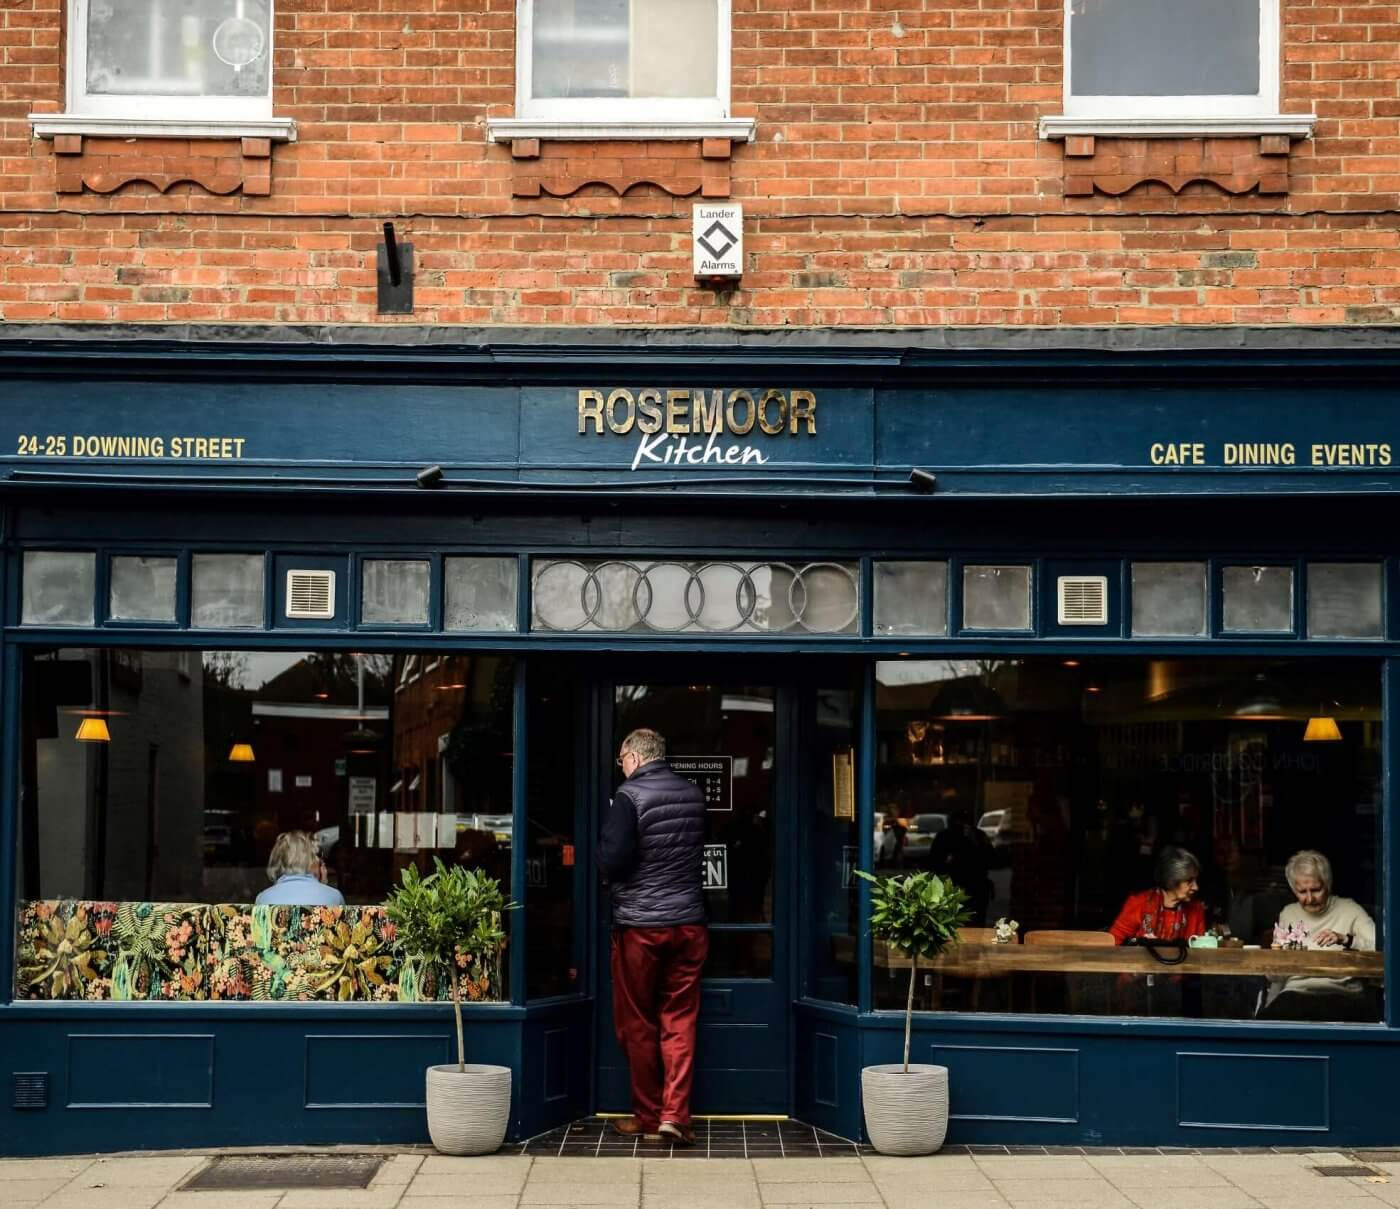 Rosemoor Kitchen | The Mustcard